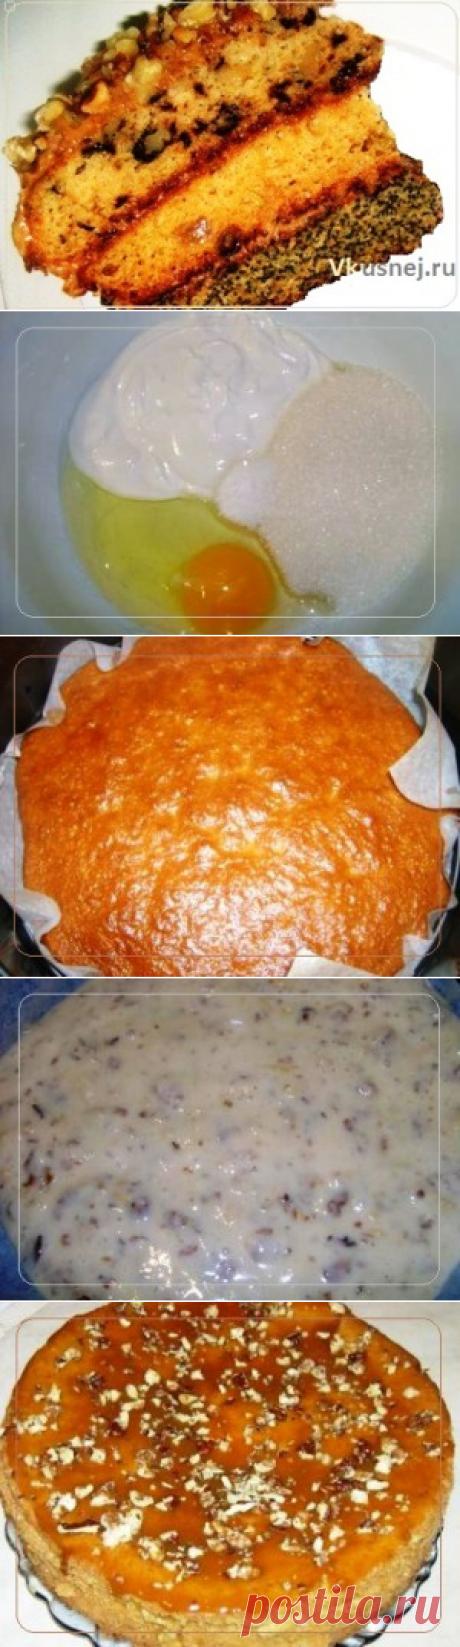 Торт «Три богатыря» | Рецепты вкусно